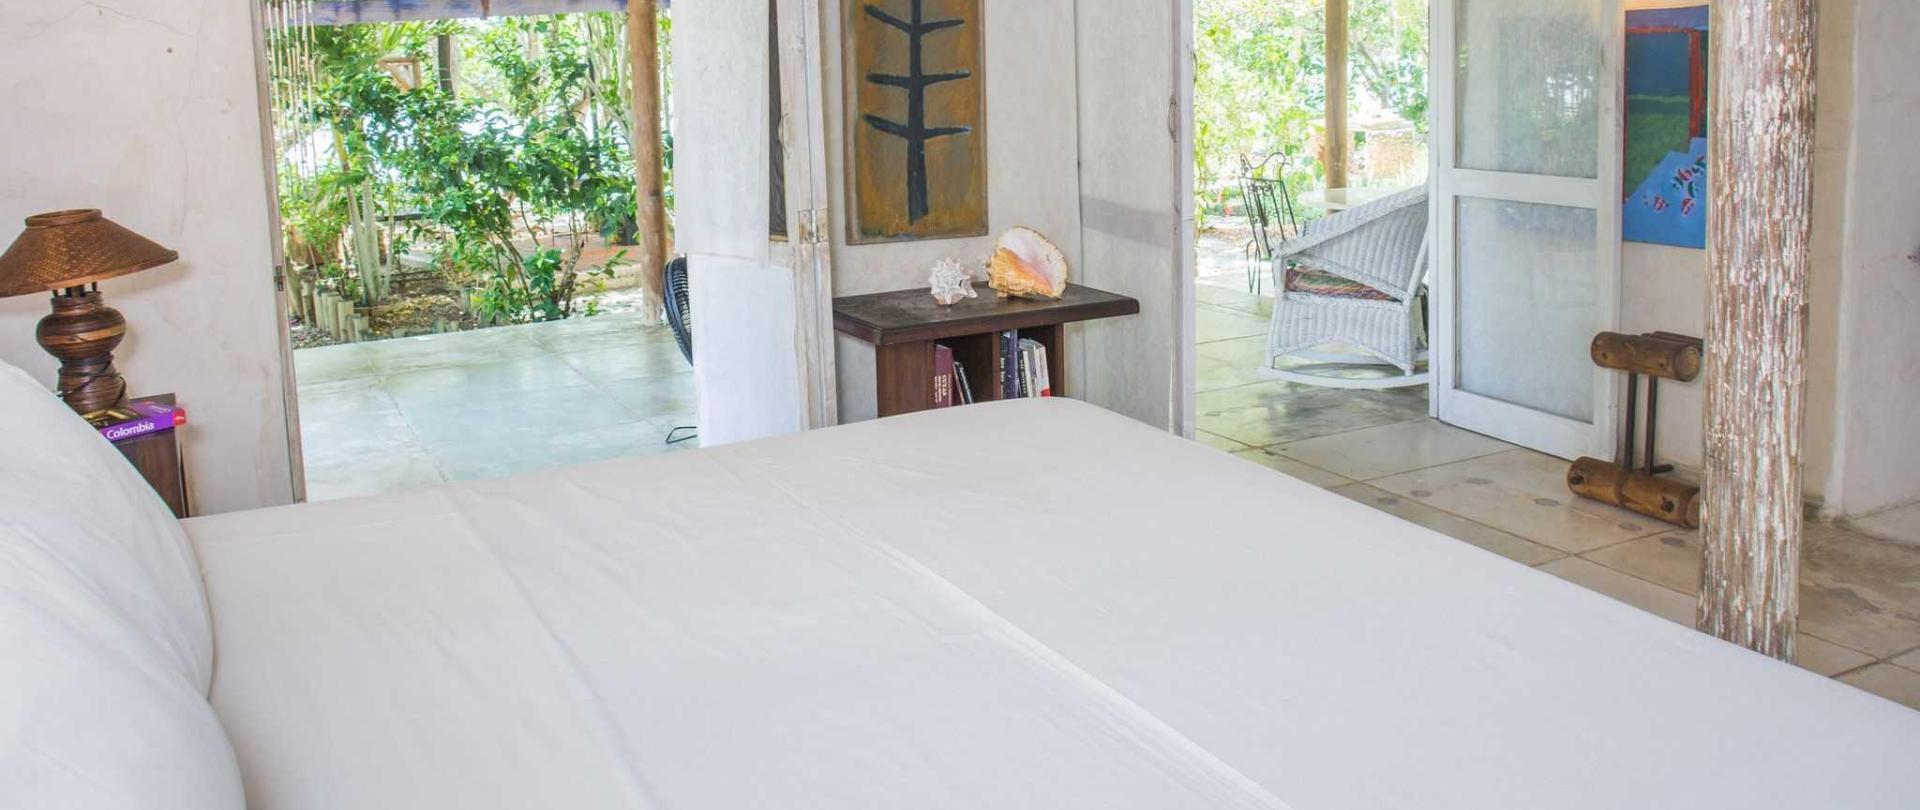 hotel-playa-manglares-17-1.jpg